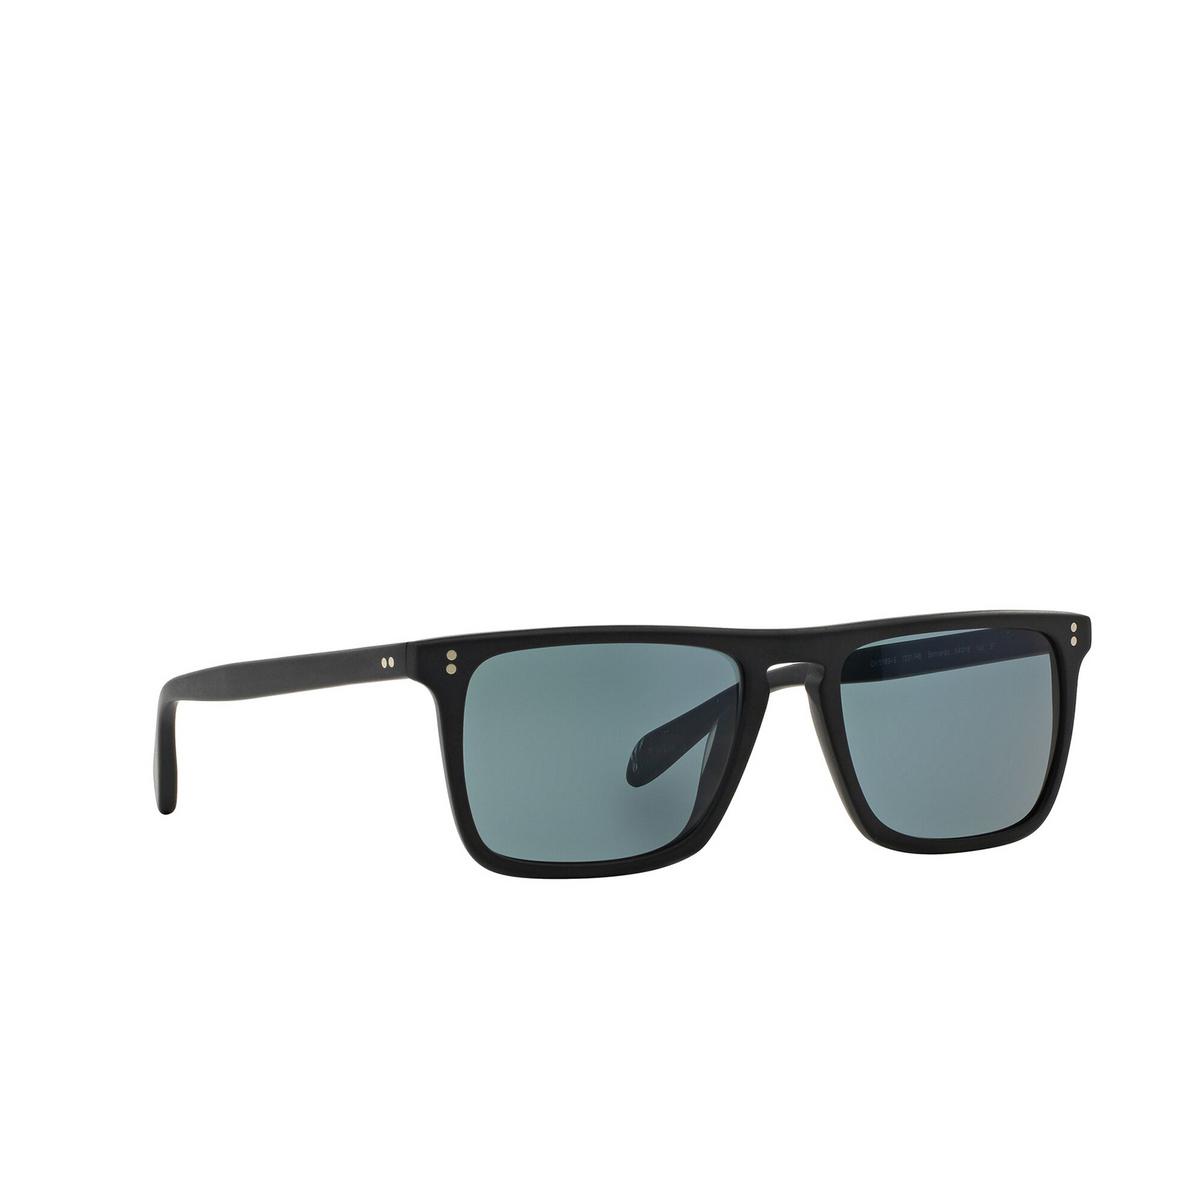 Oliver Peoples® Square Sunglasses: Bernardo OV5189S color Semi Matte Black 1031R8 - three-quarters view.